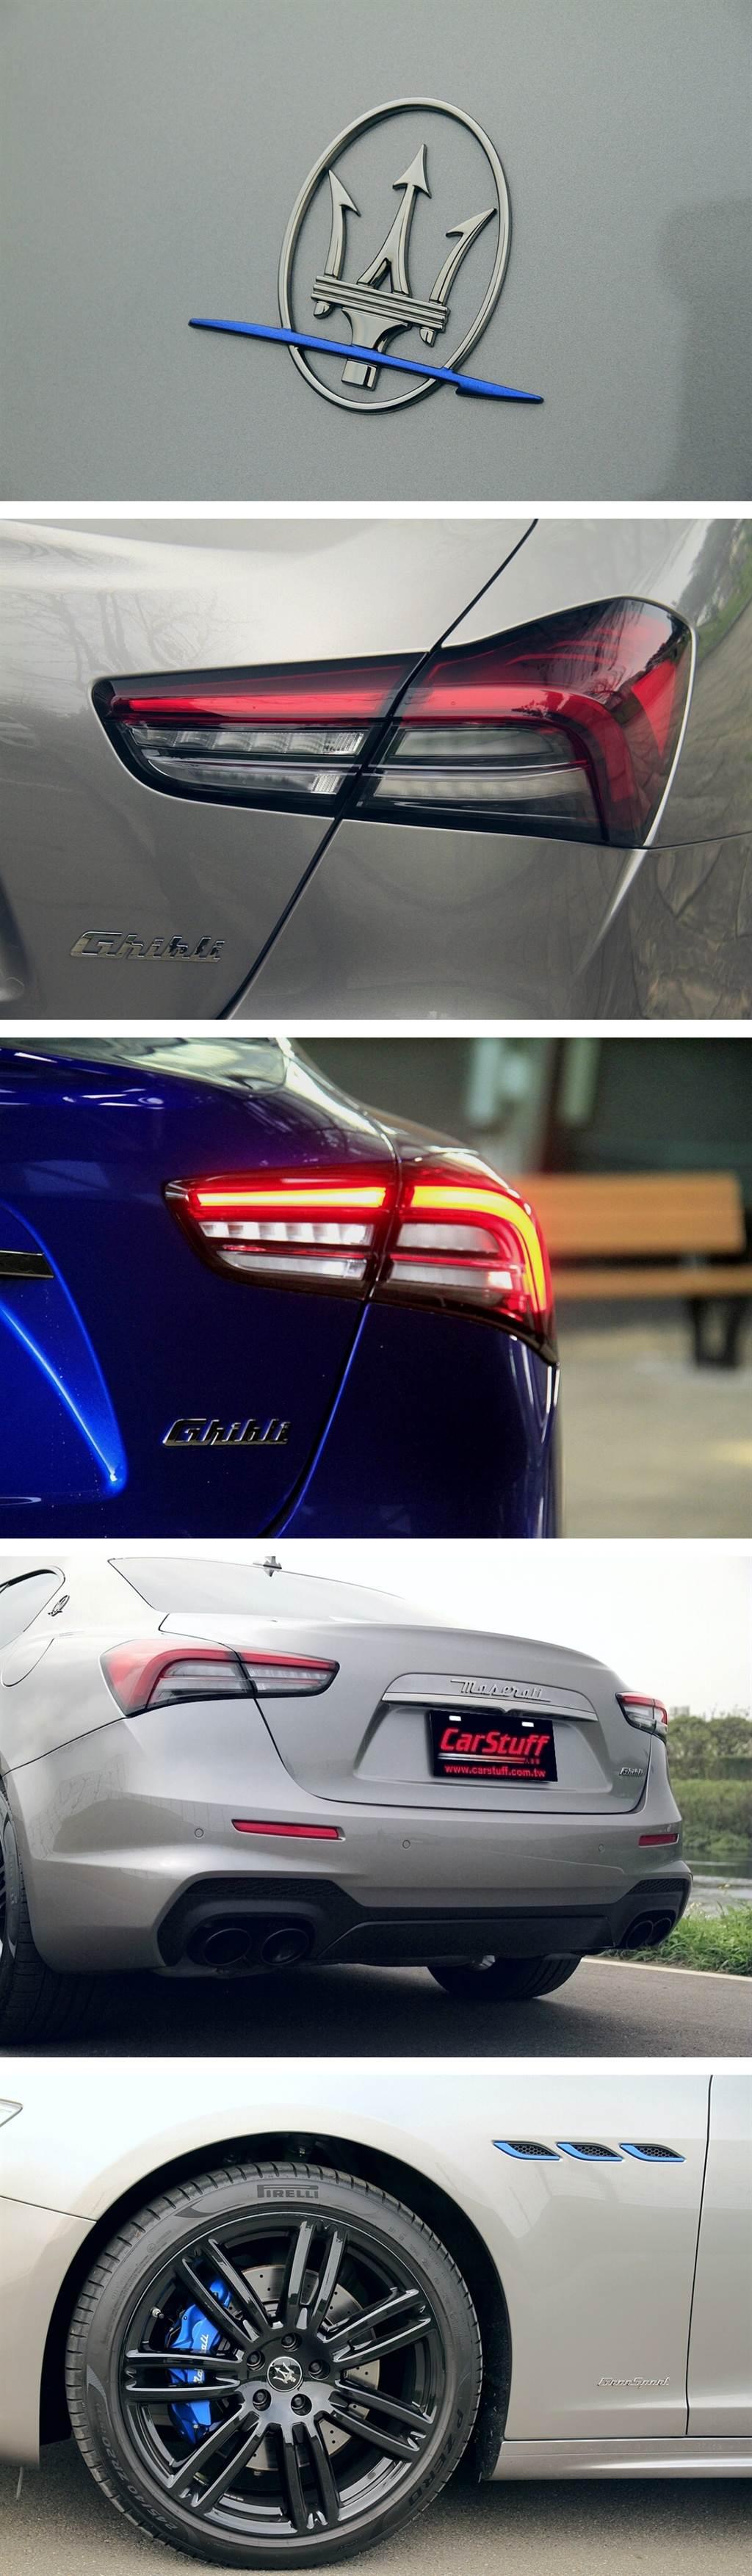 Ghibli MHEV GranSport車型其中一個既美觀又實用的亮點:前六活塞/後四活塞卡鉗的高性能版煞車系統,並且配置前360mm/後345mm打孔通風碟盤,制動反應相當犀利應付330匹動力非常夠用,但來令片材質的金屬含量可能高了些,煞停前不免有些銳利的聲響發出。